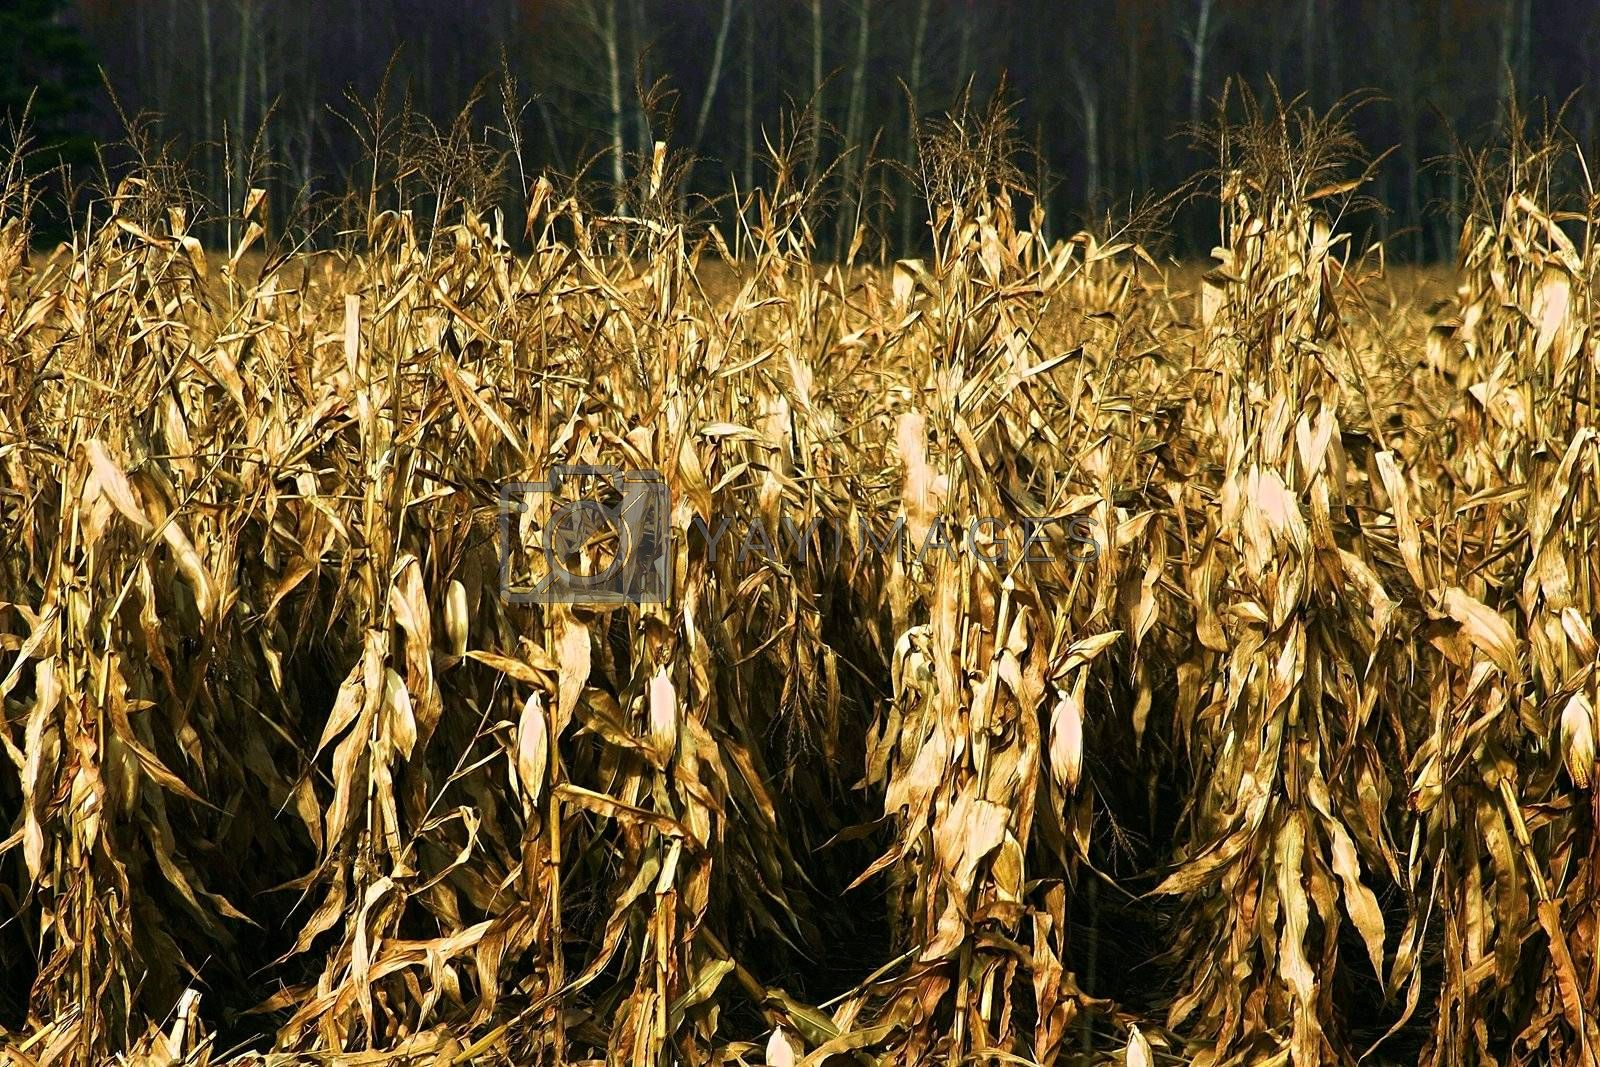 Road side dried corn field in the fall